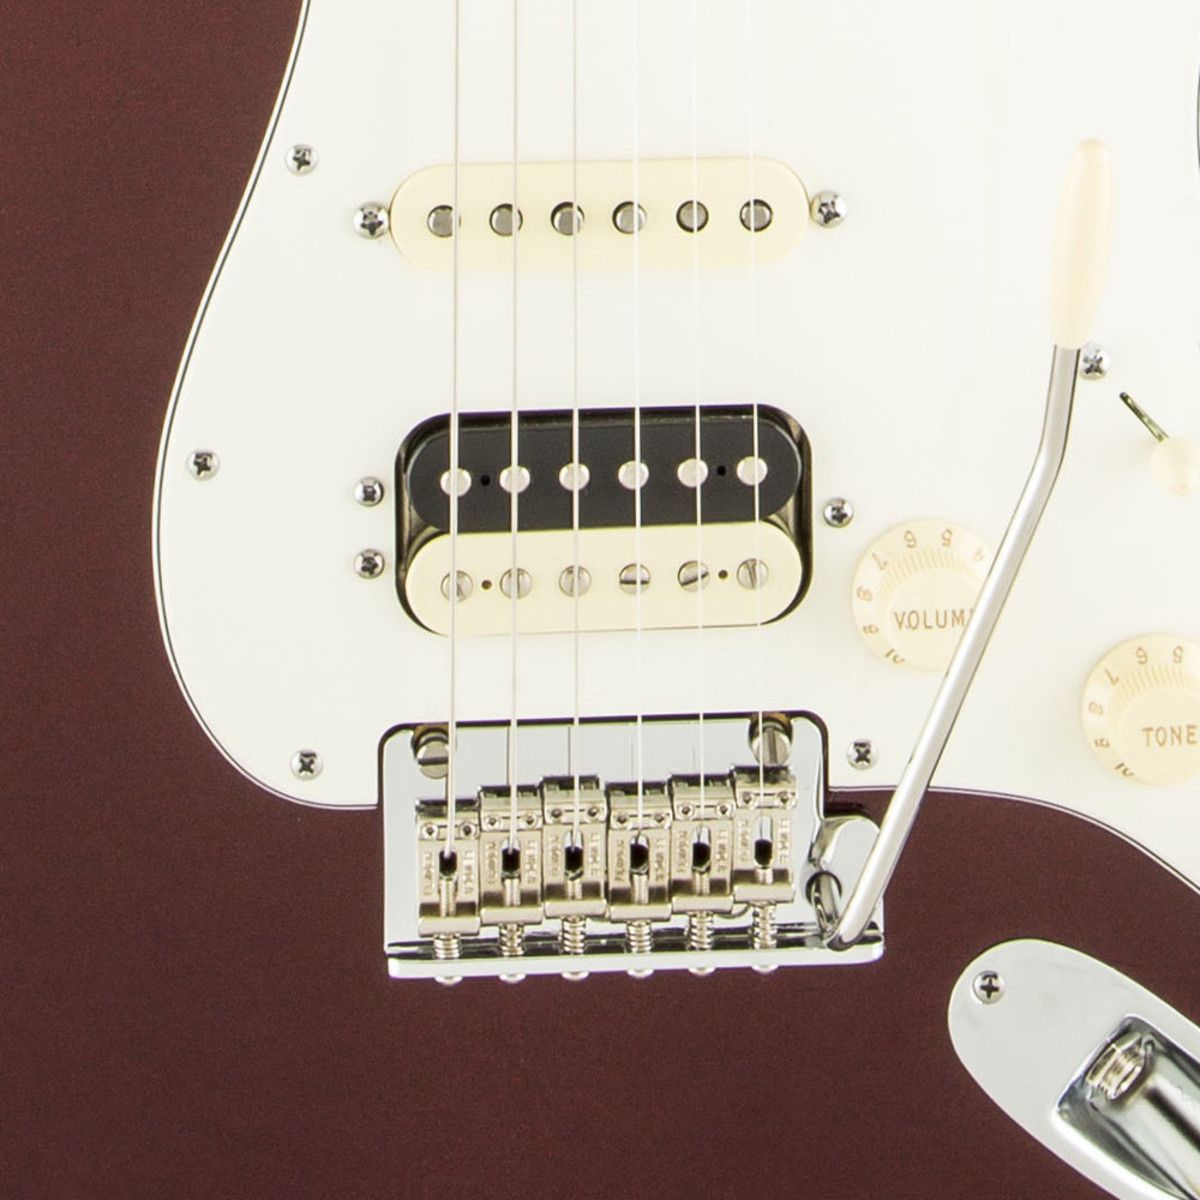 Disc Fender American Standard Strat Hss Shawbucker Bordeaux Violin Bass Guitar Wiring Diagram Mn Metallic